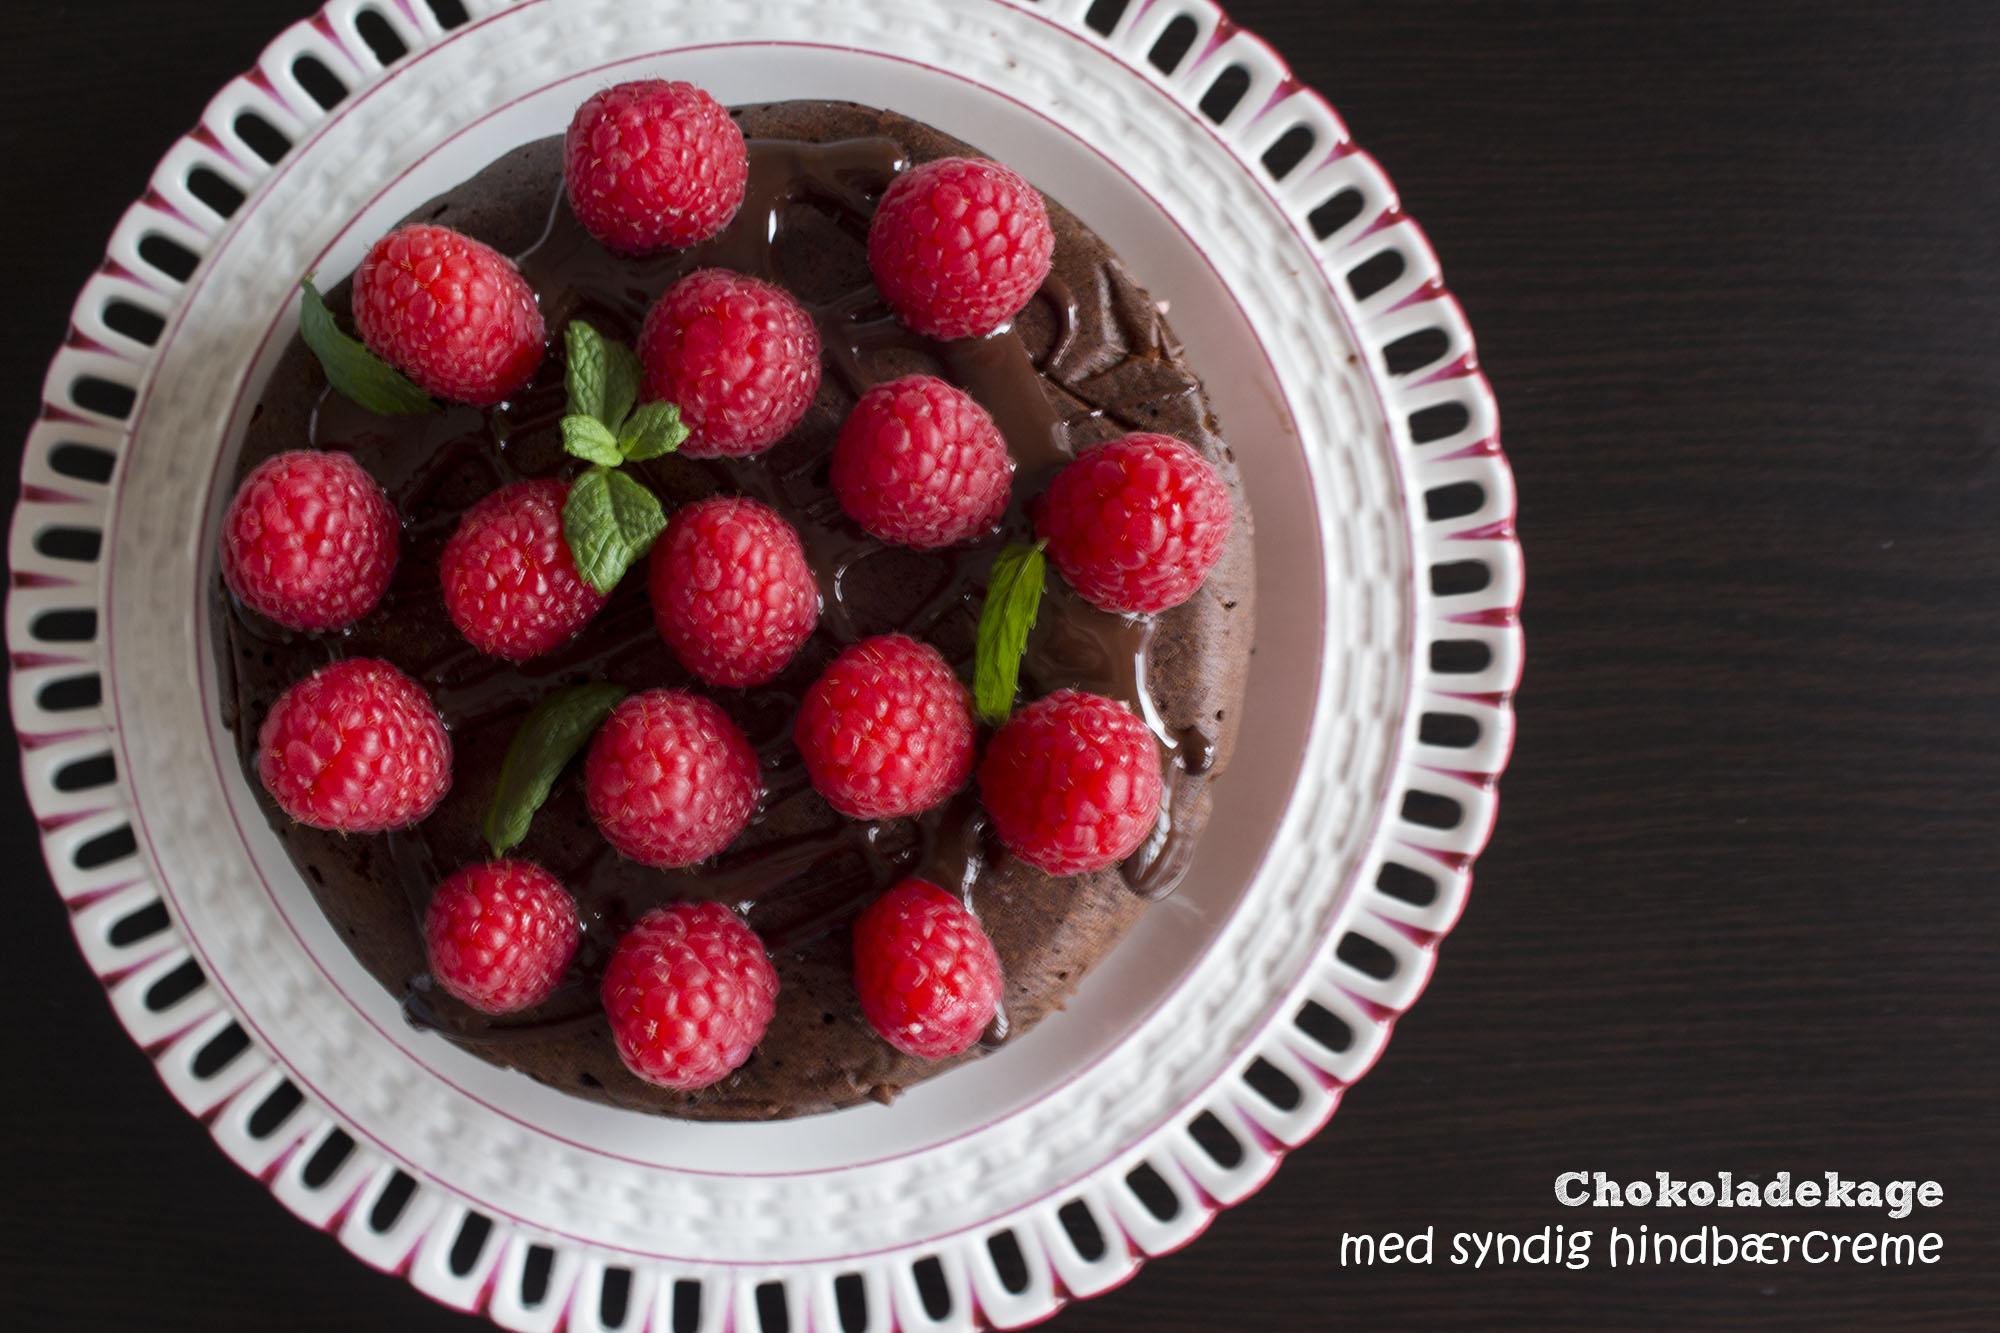 Chokoladekage med syndig hindbærcreme